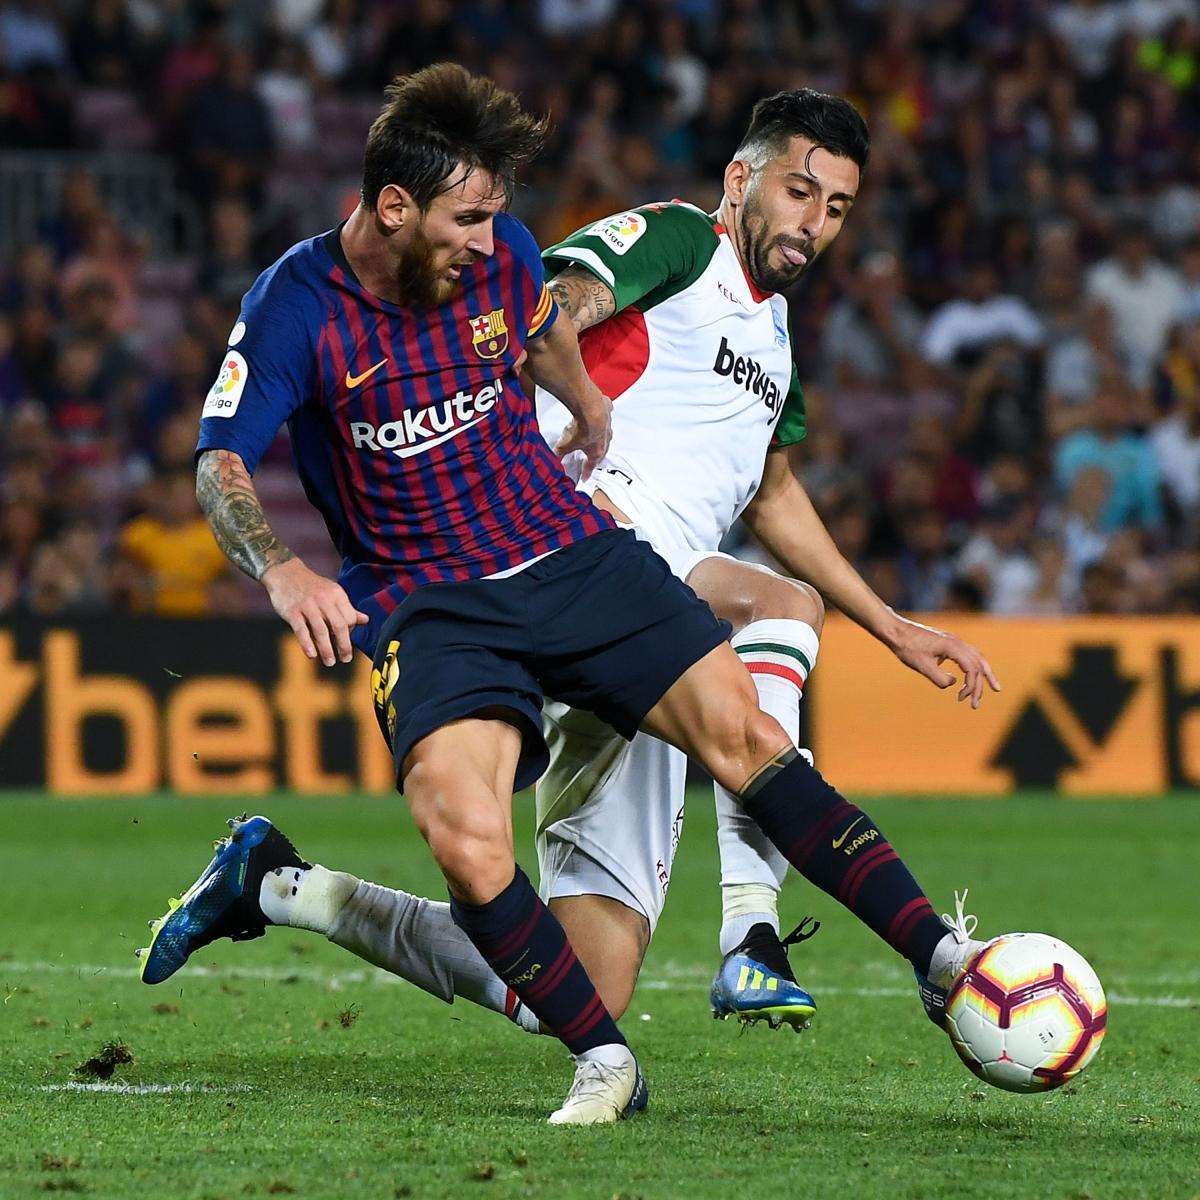 Liverpool Vs Barcelona Preview And Prediction: Alaves Vs. Barcelona: Odds, Preview, Live Stream And TV Info